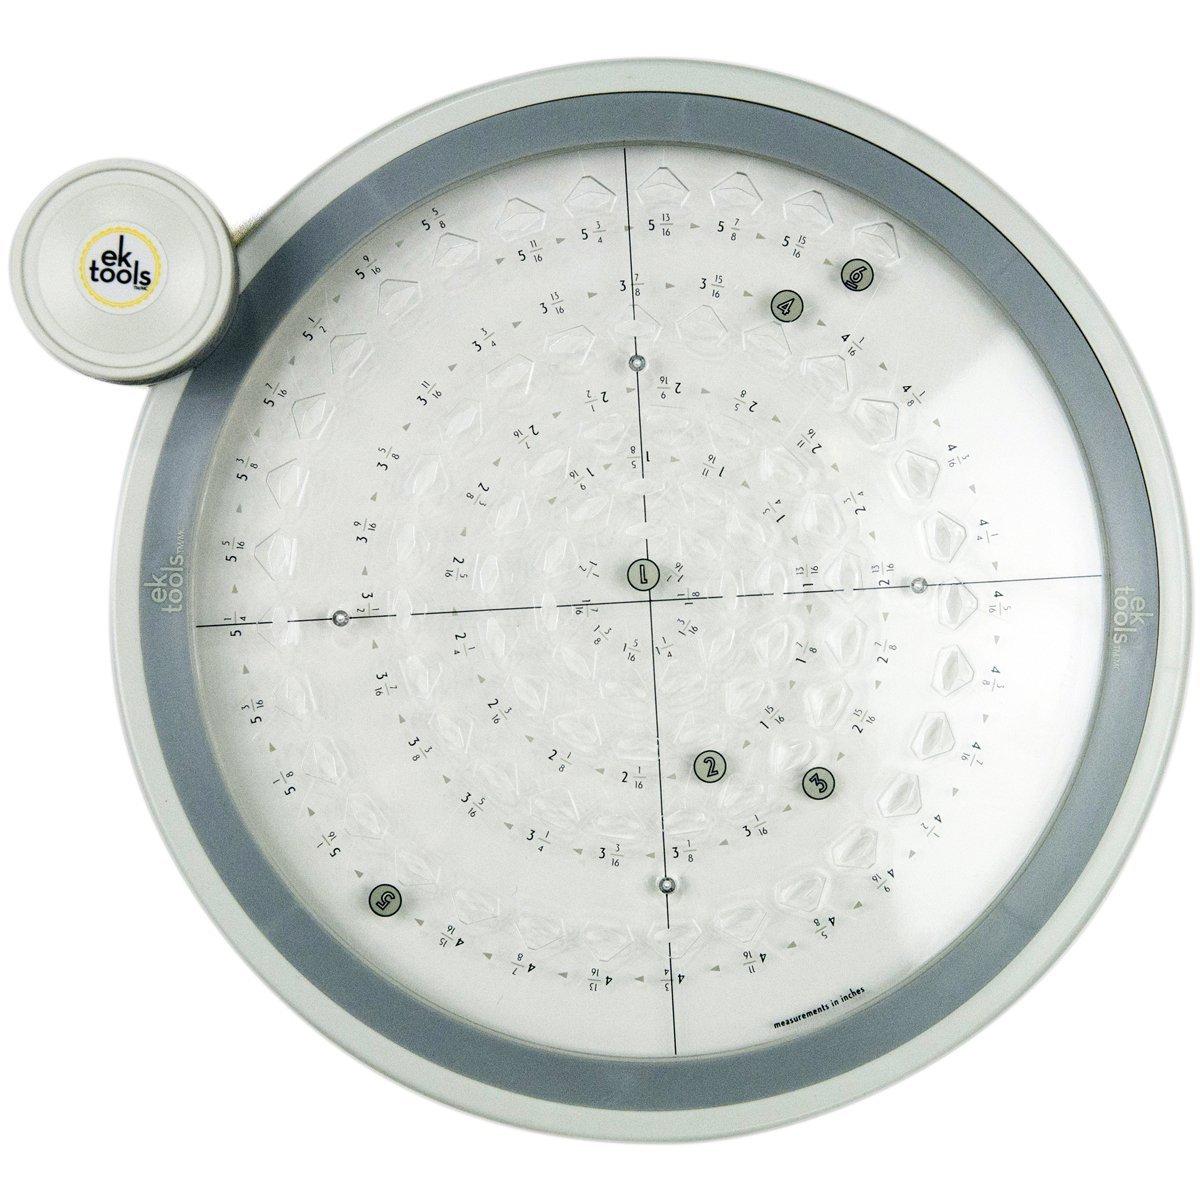 EK tools Scissor Pro Circle Cutter